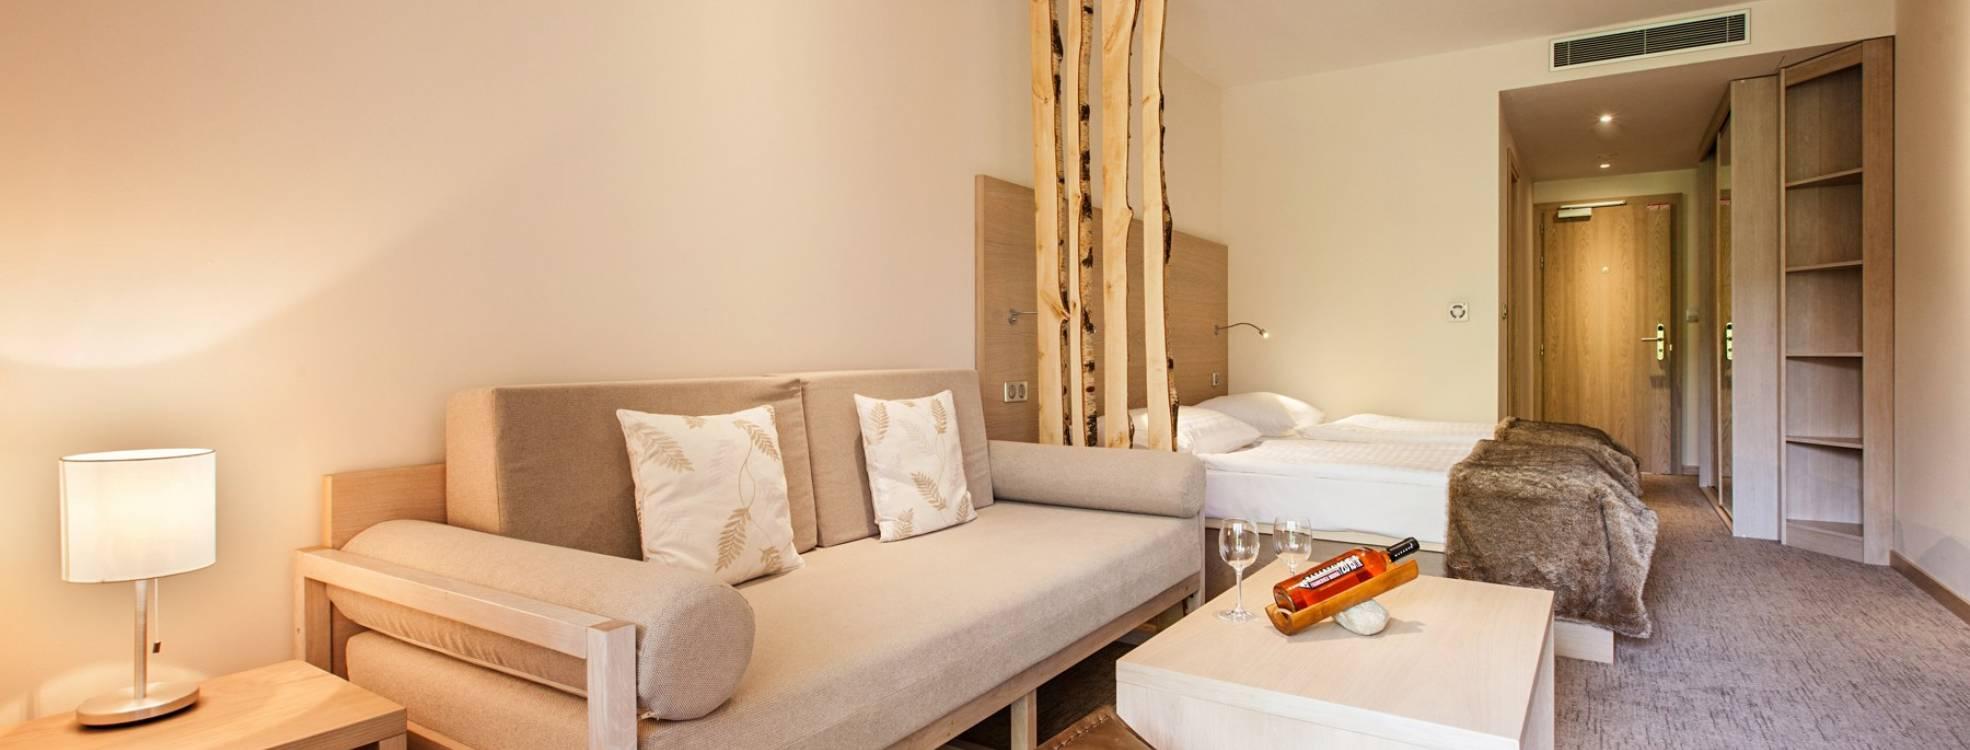 Dvojlôžková izba Junior Chopok - Hotel PARTIZÁN